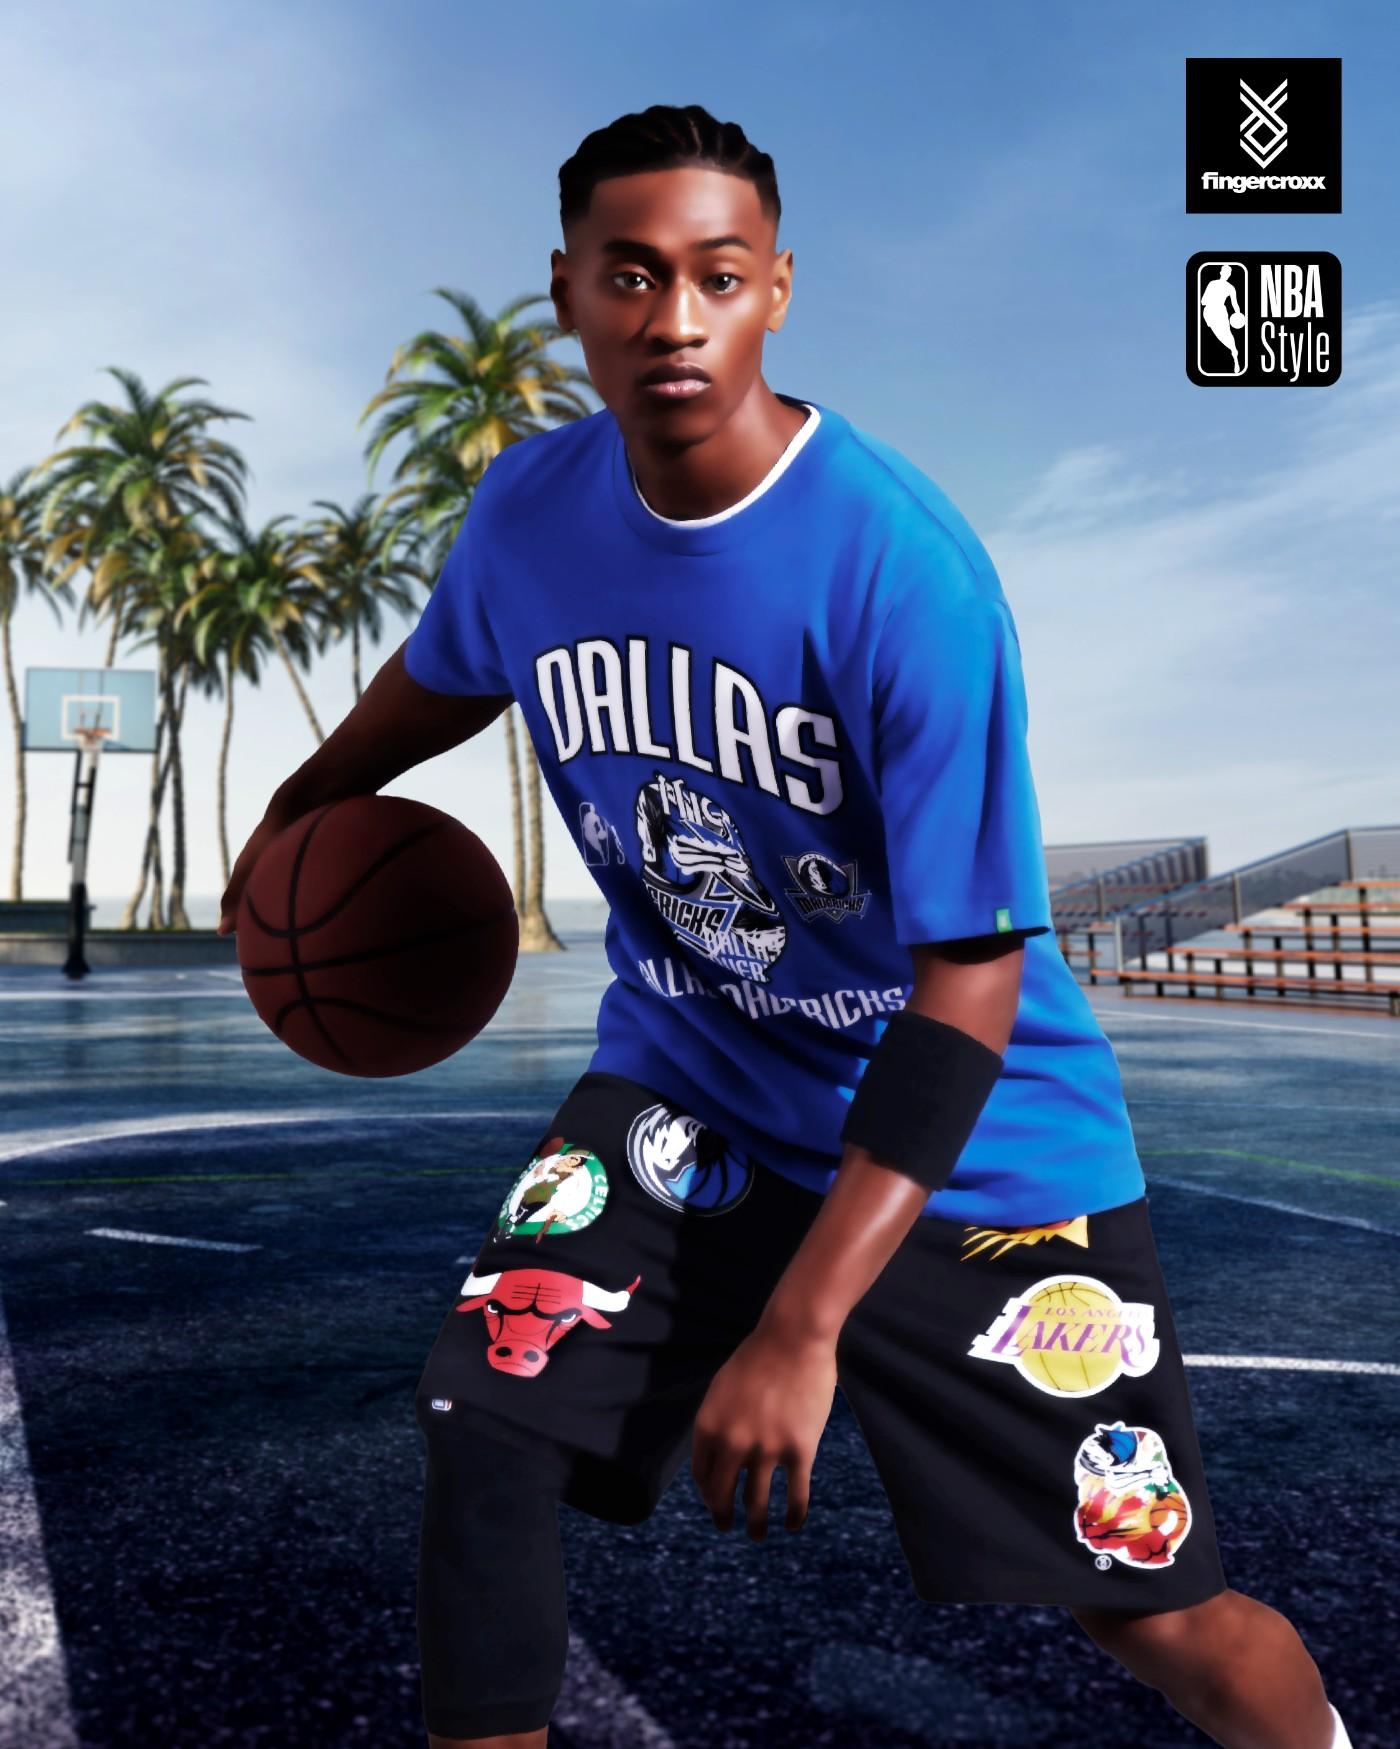 fingercroxx,NBA,发售  NBA 联名款服饰登场!穿上它给你最爱球队打 Call!